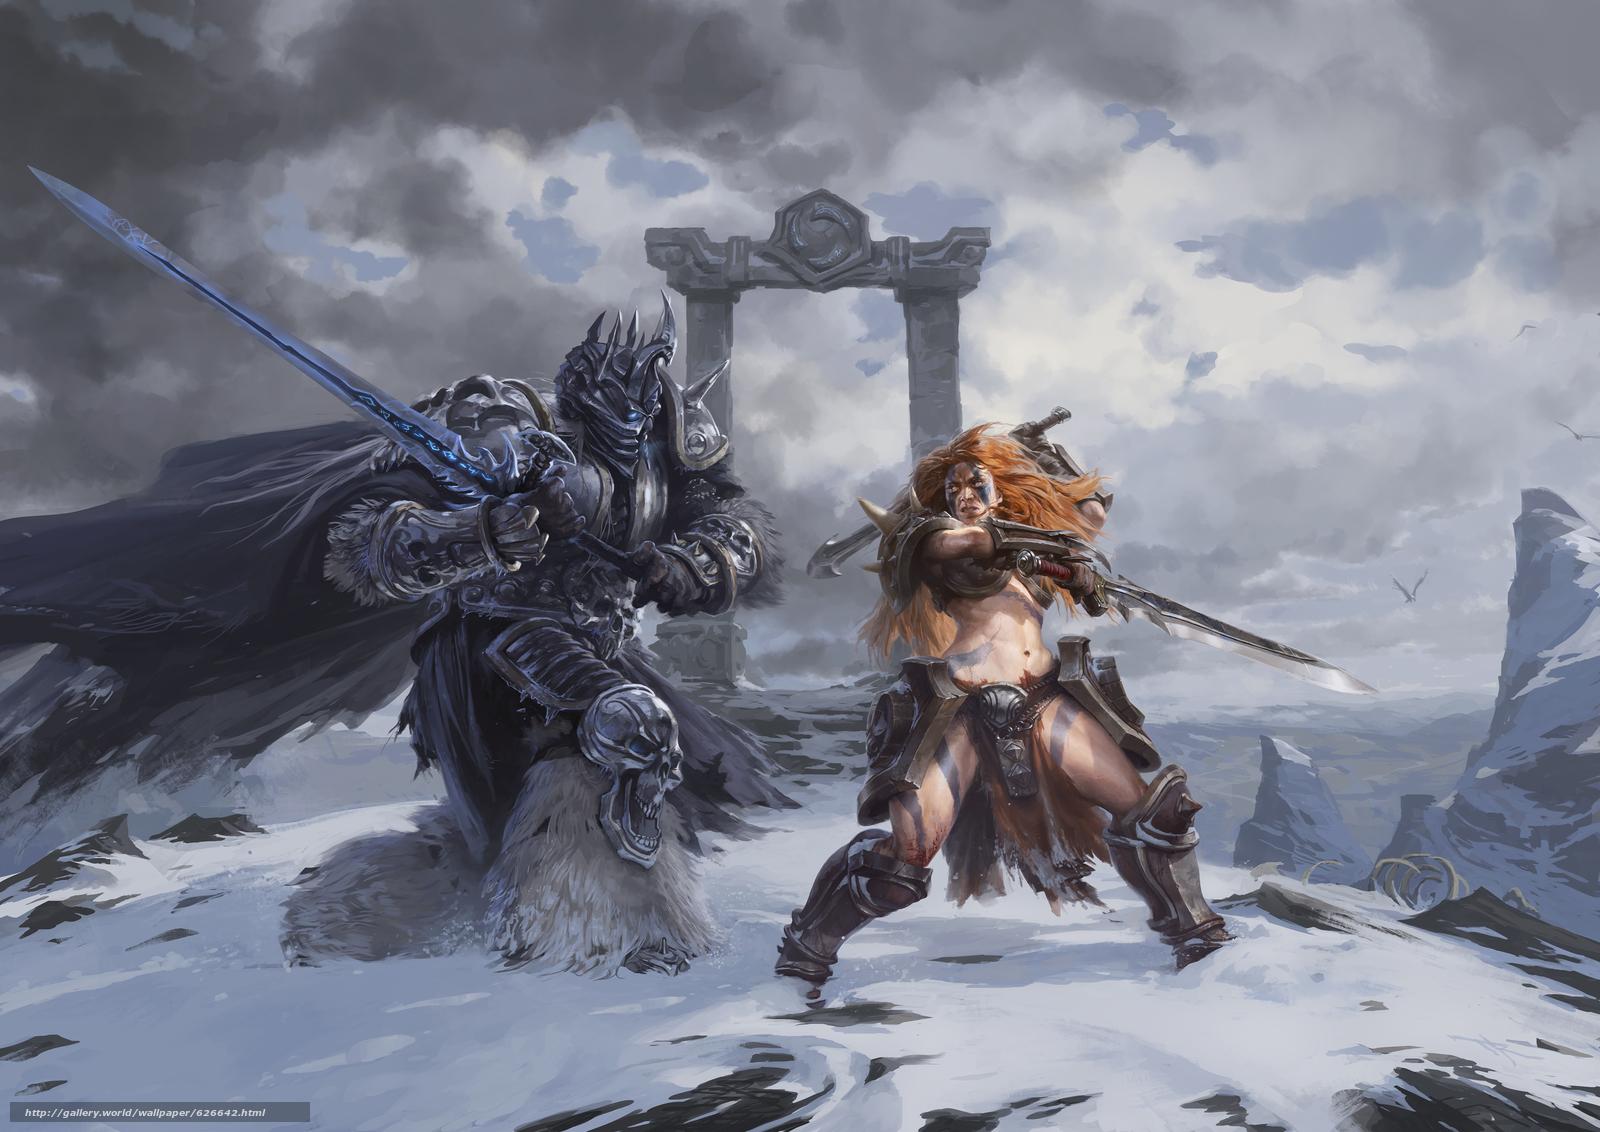 Heroes of the Storm, Arthas, The Lich King, Sonya, Wandering Barbarian, Артас, Король-лич, Соня, Странствующий варвар, меч, сражение, битва